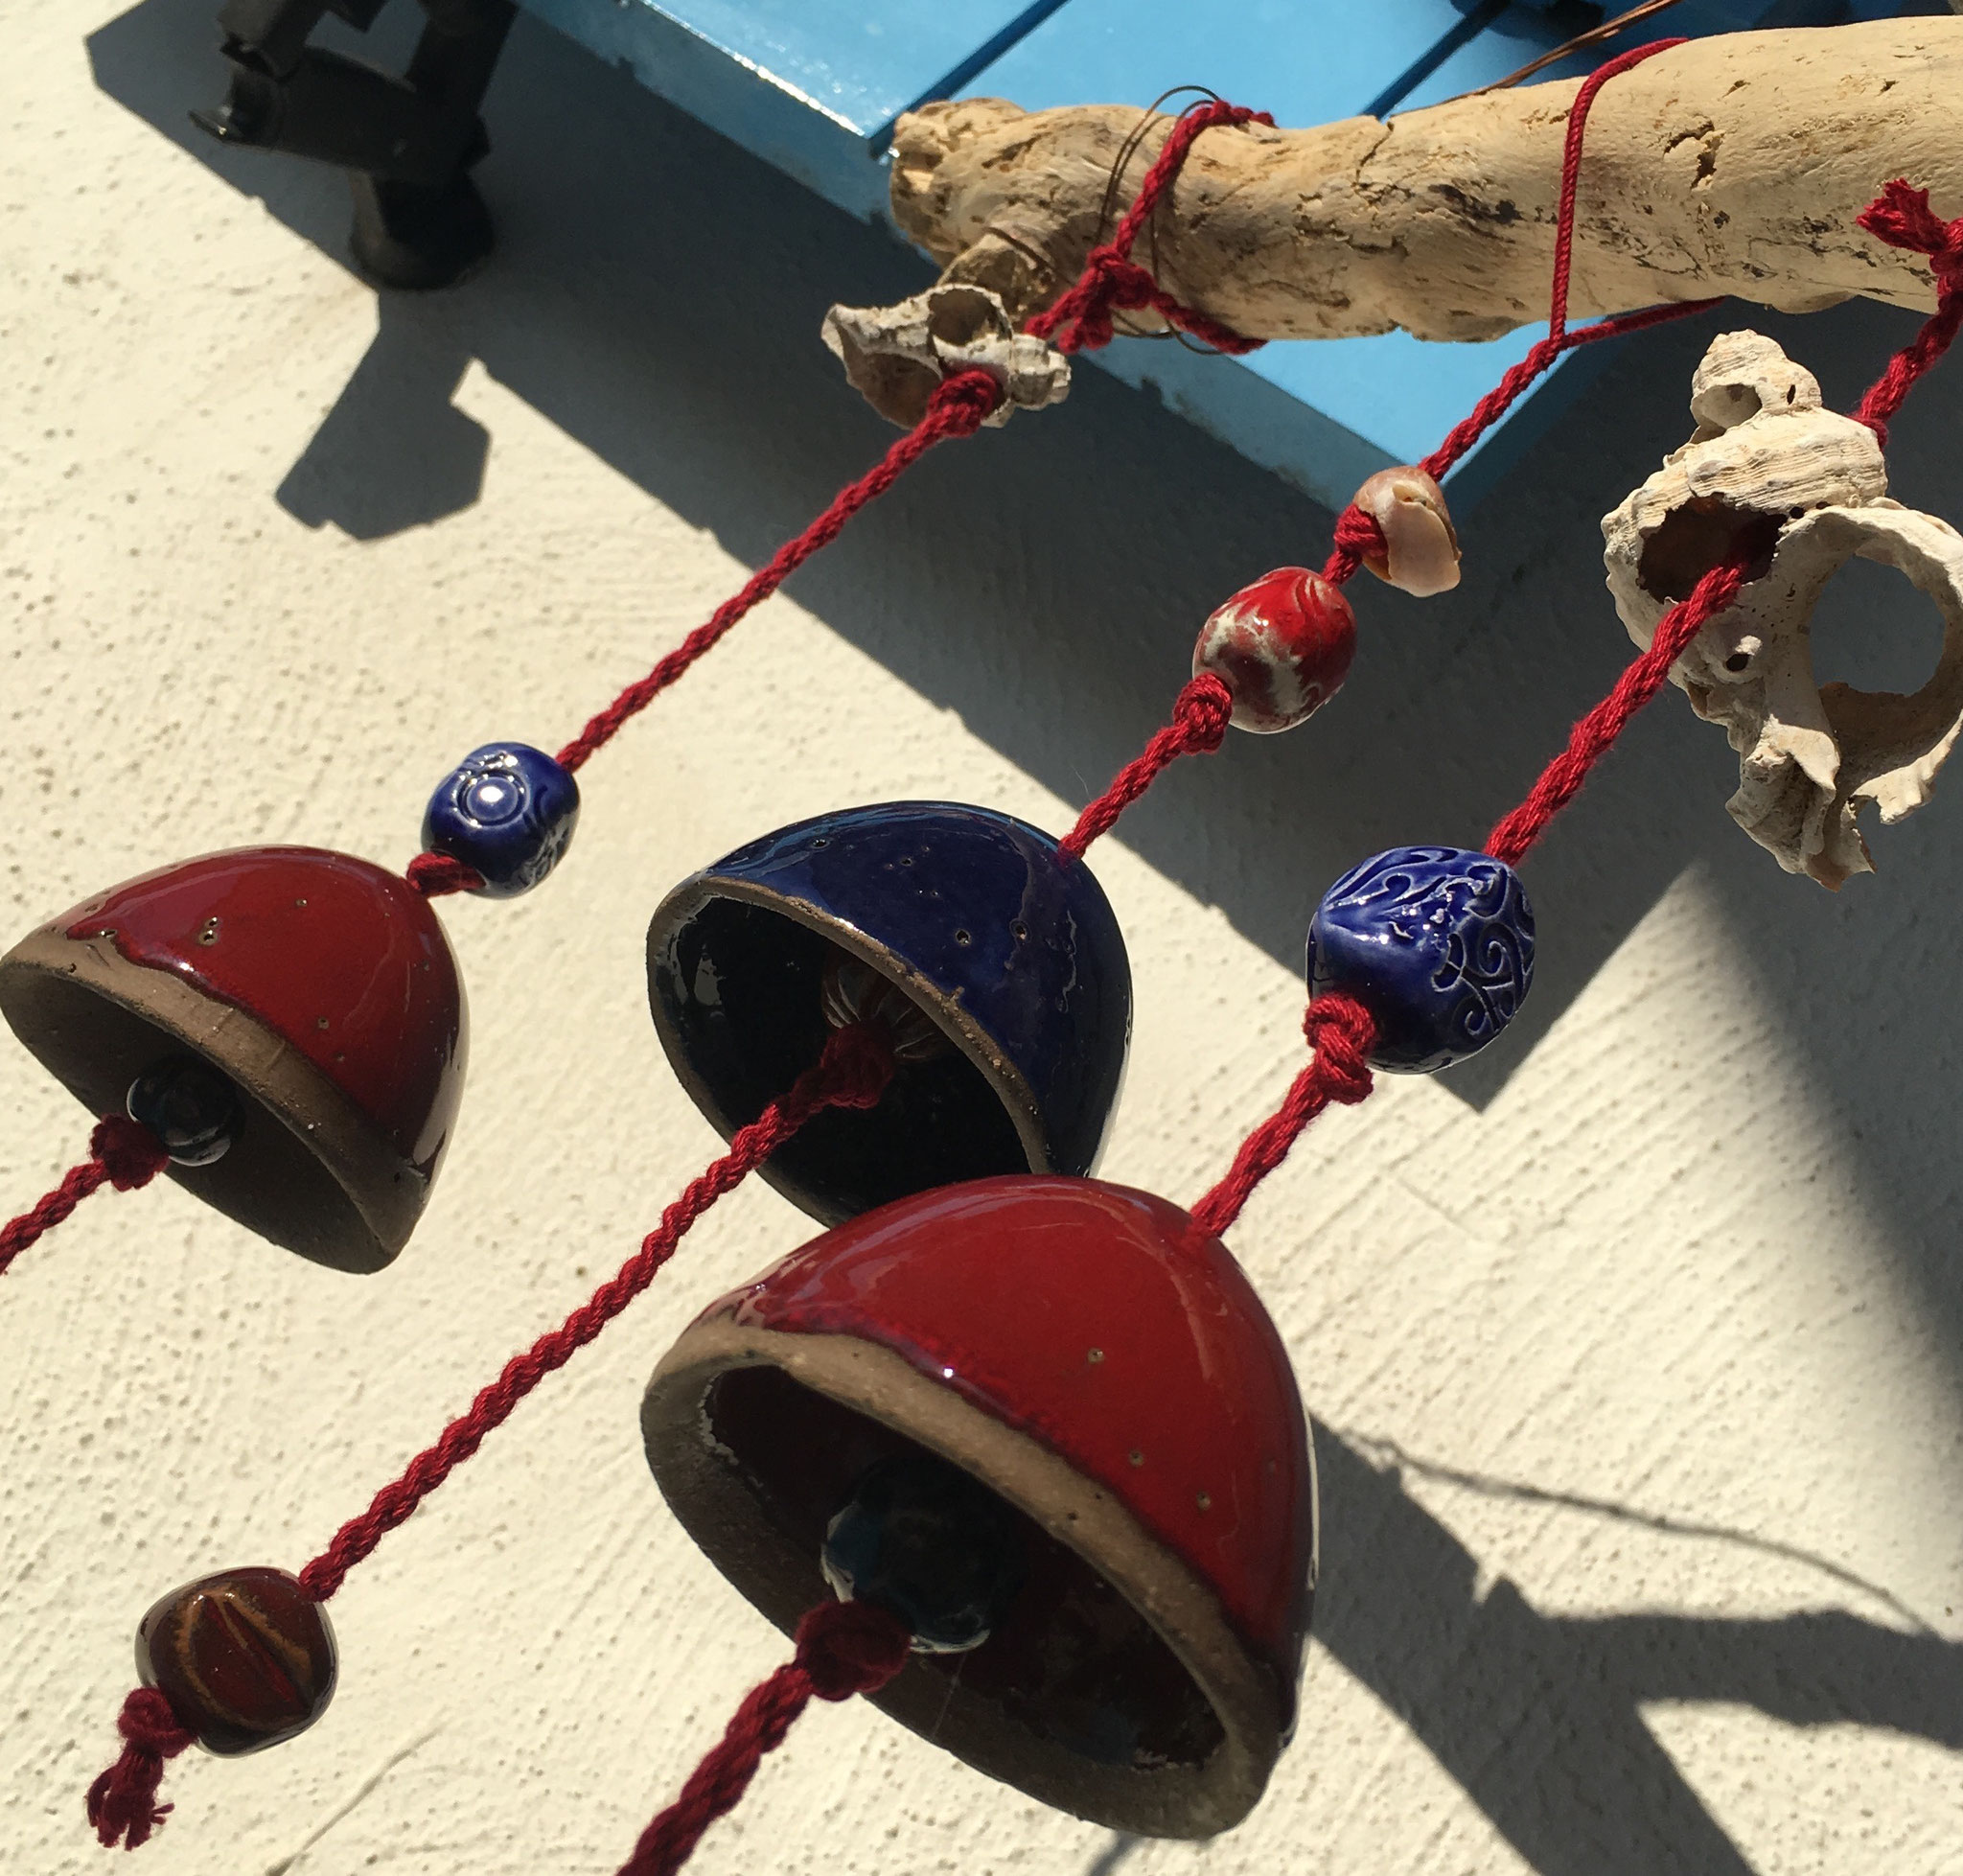 Campane in ceramica Le Terre di Rò 15€